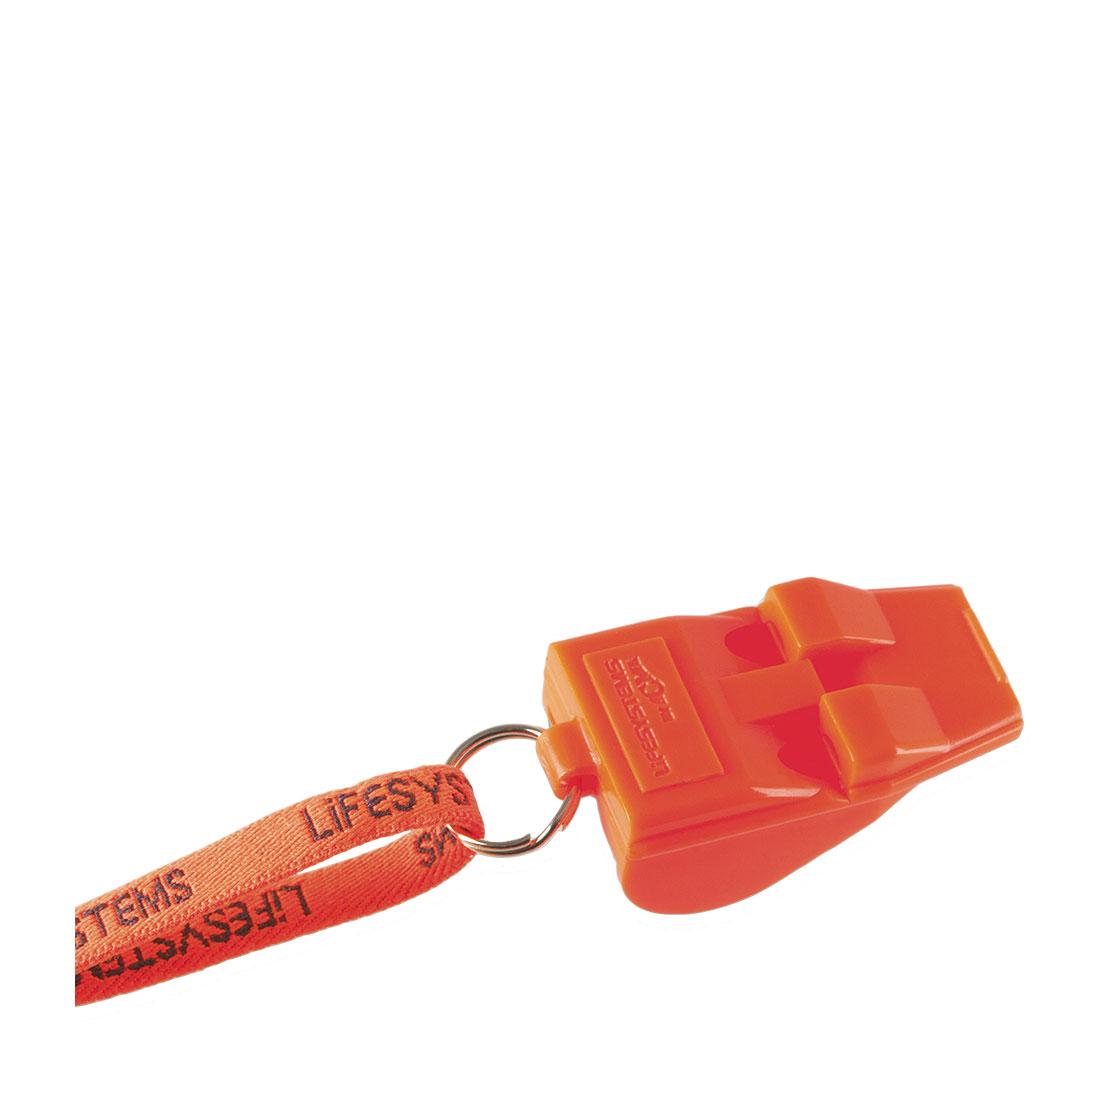 Survival Whistle